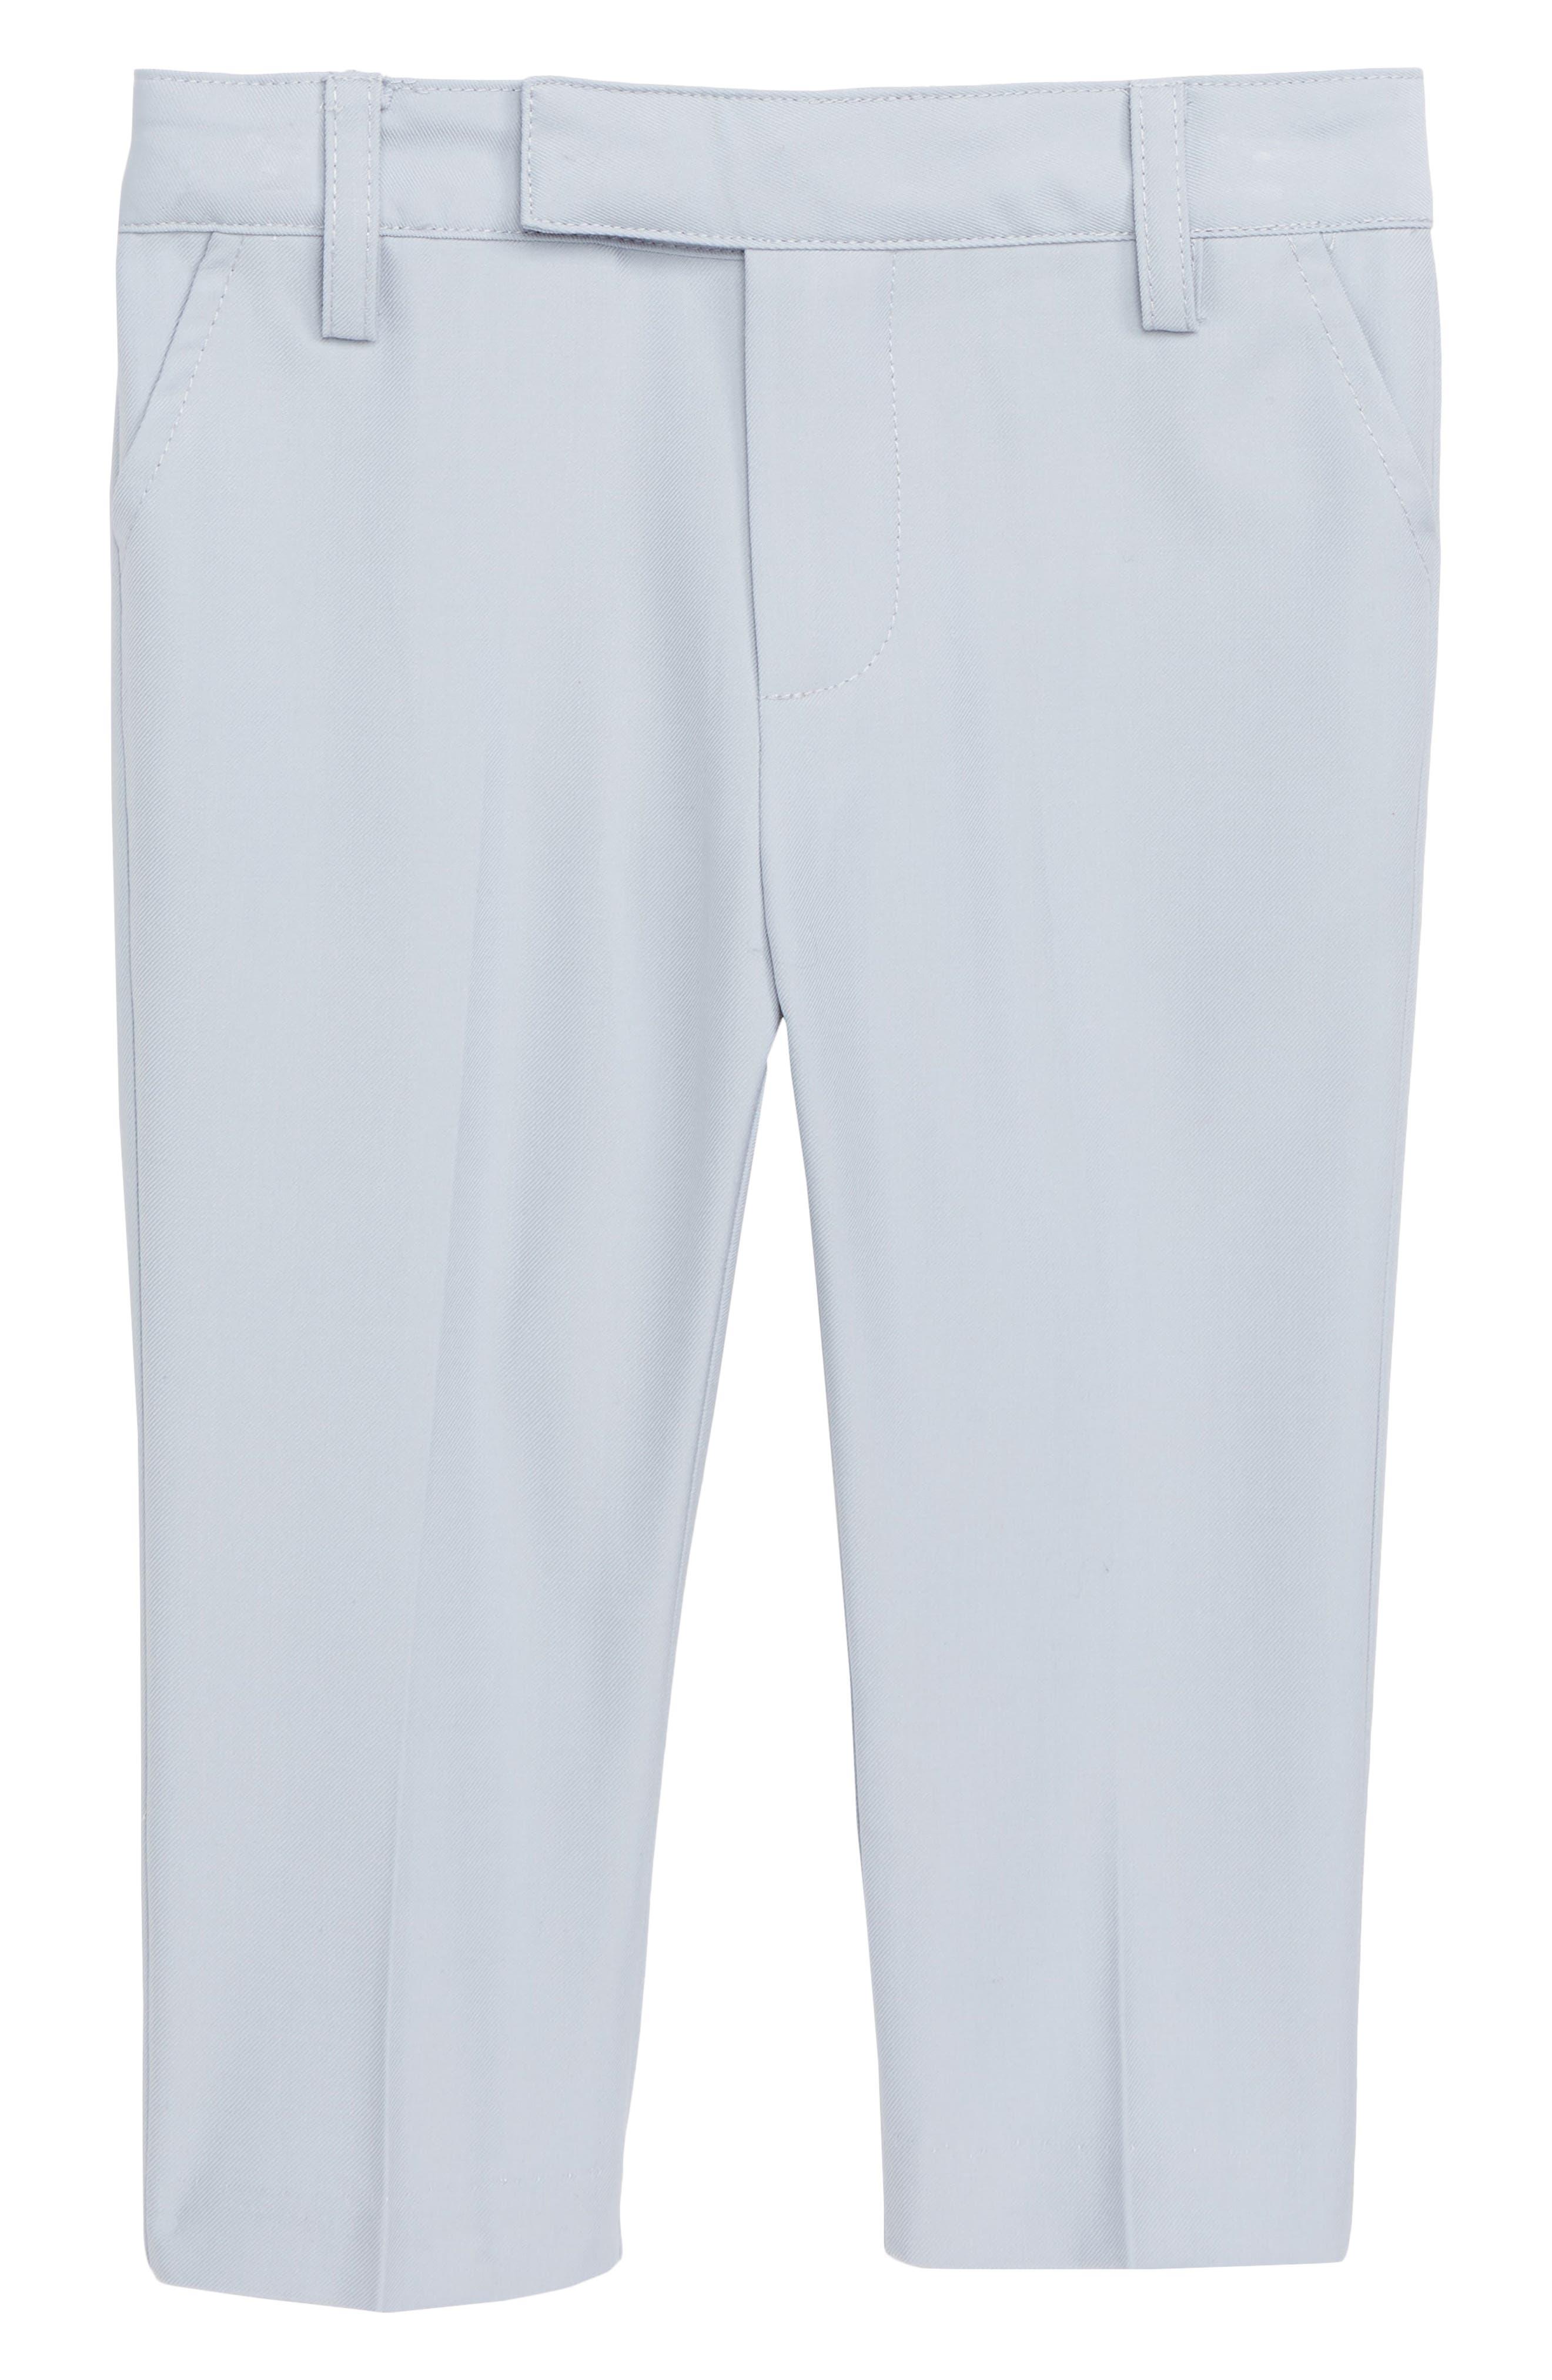 Clothing, Shoes & Accessories Size 0 Bardot Junior Boys Blue Shorts Braces